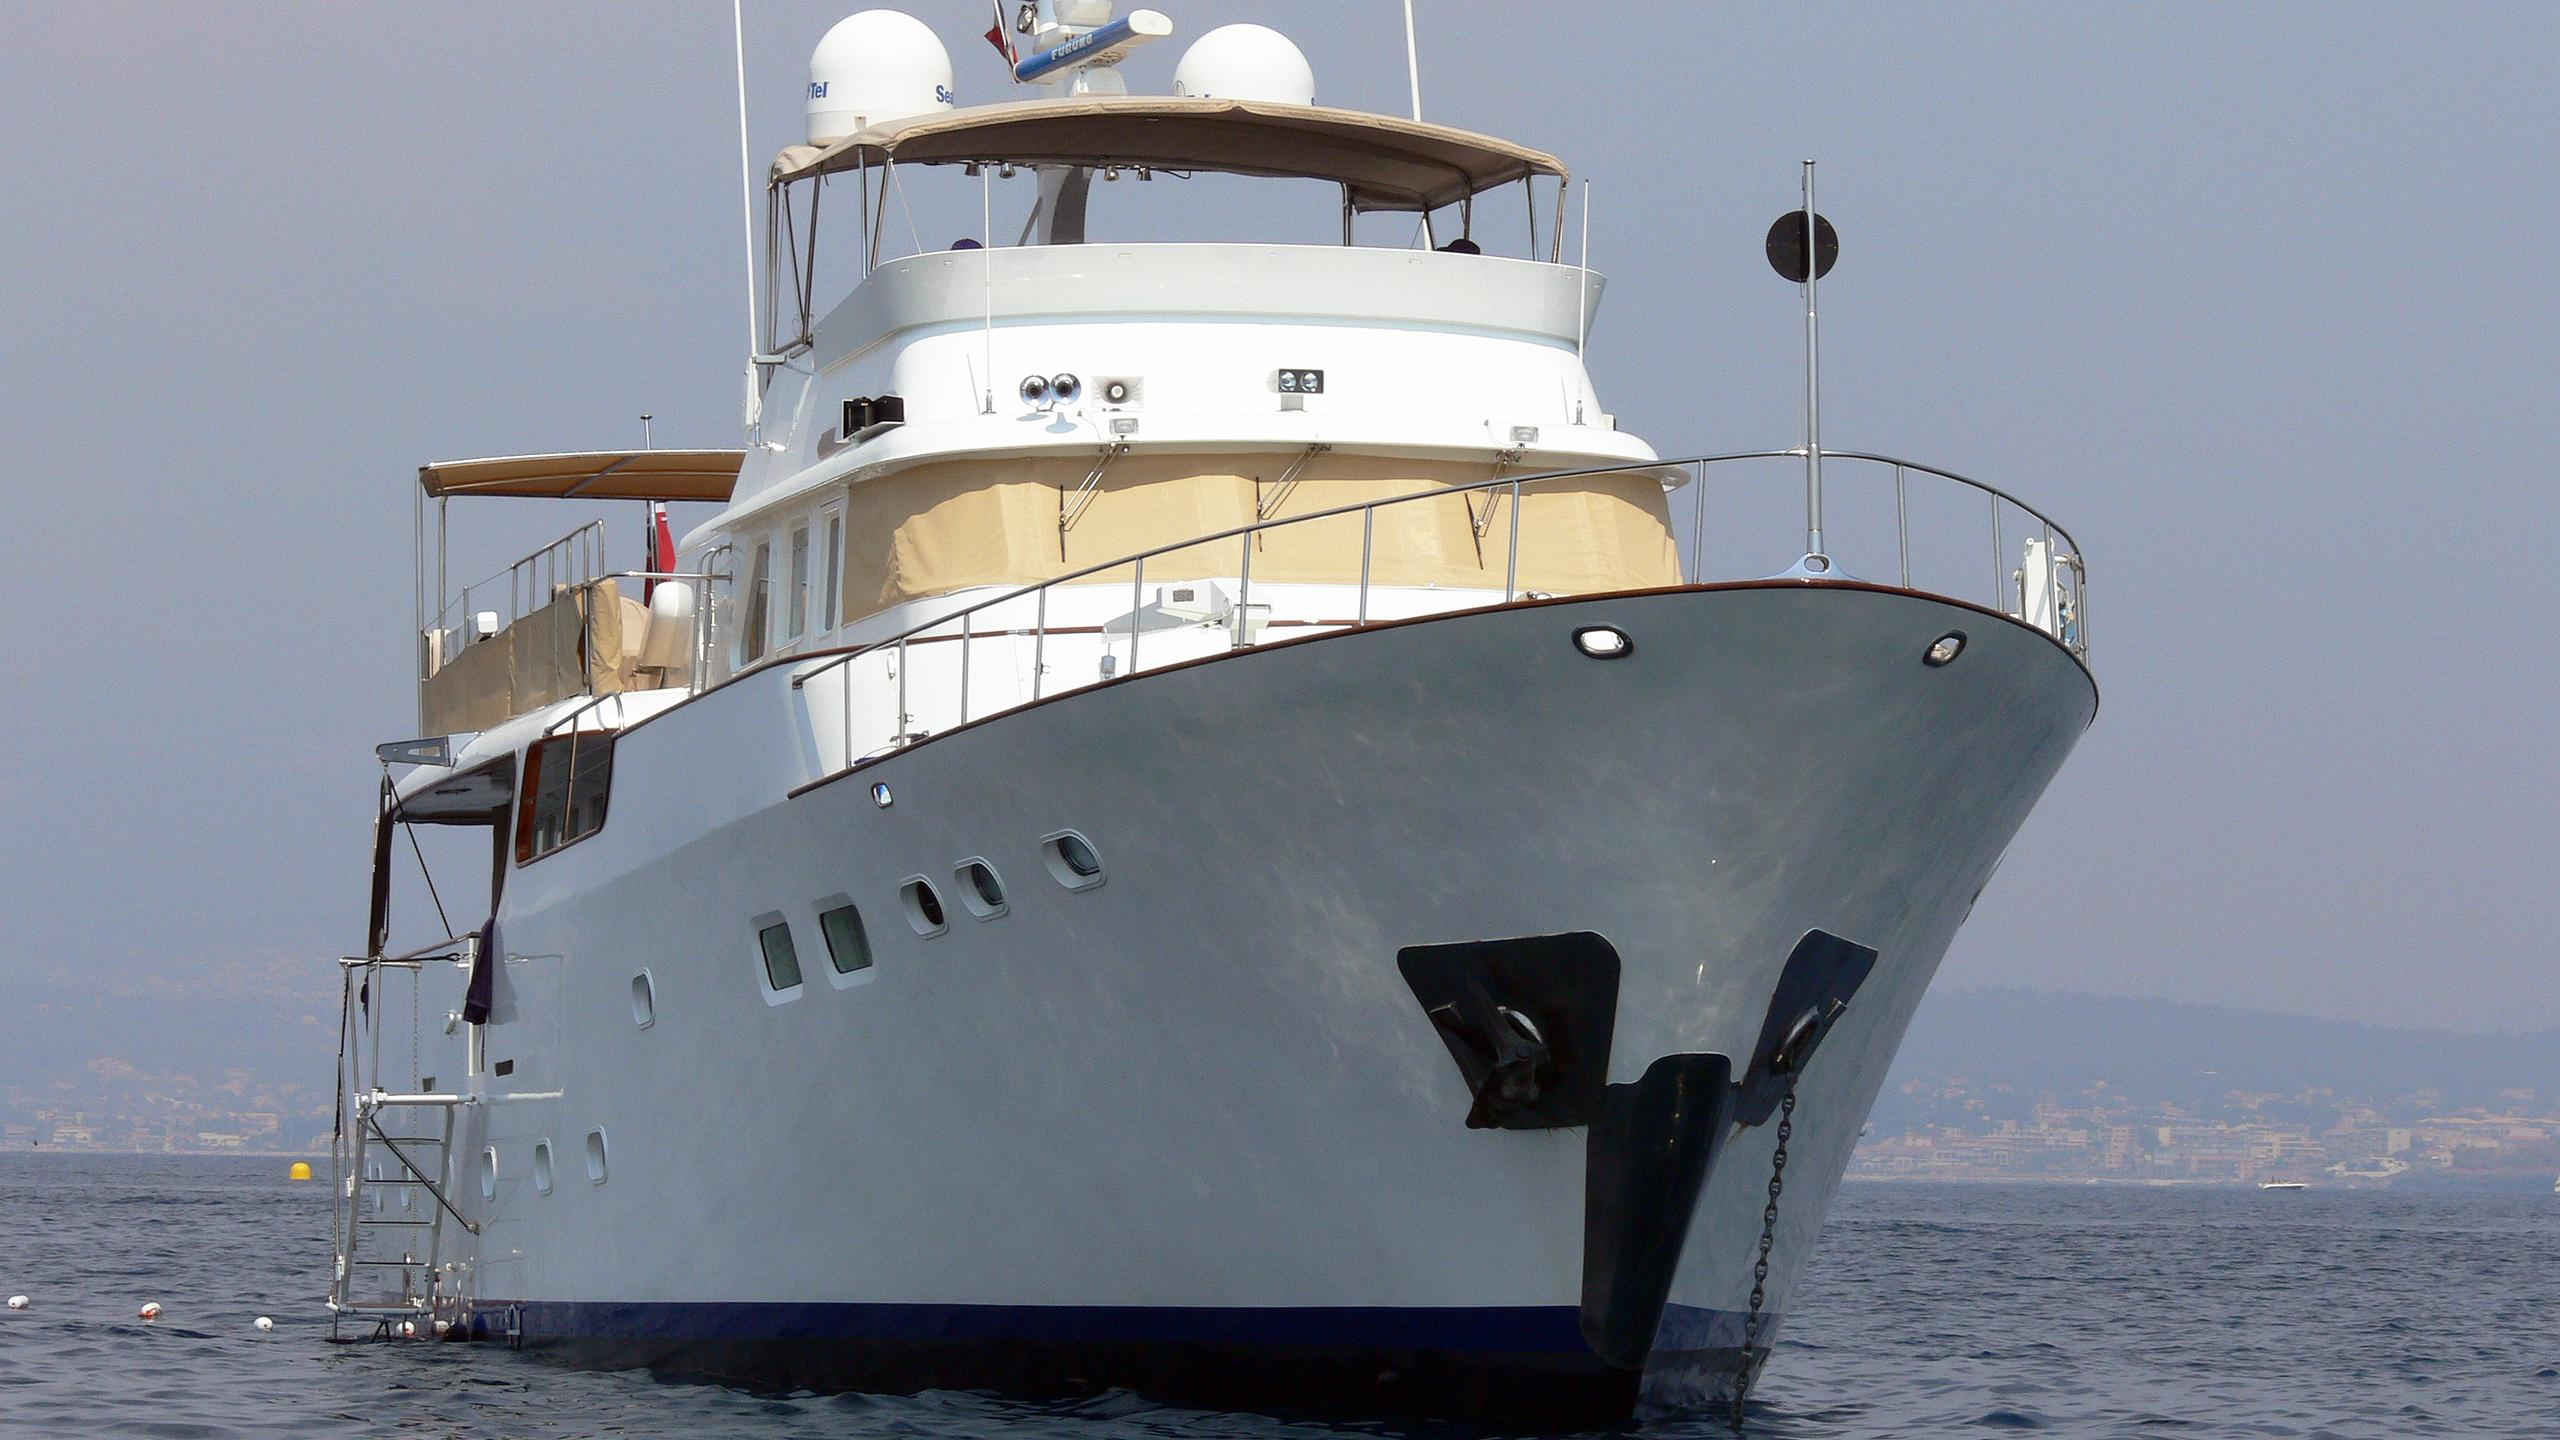 il-odyssey-motor-yacht-benetti-mediterraneo-1967-33m-bow